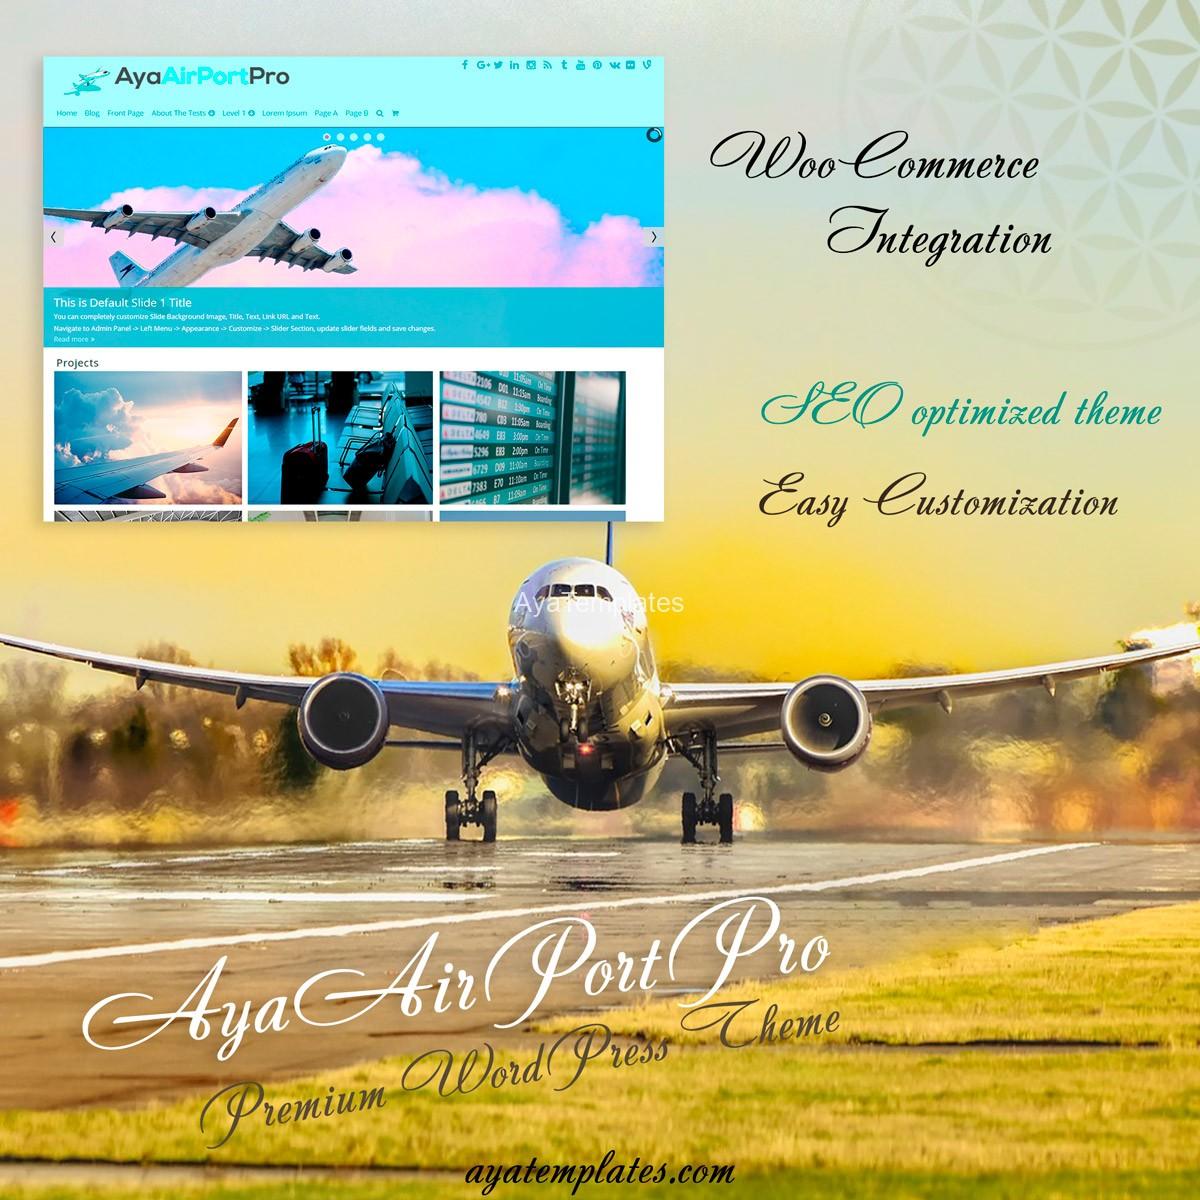 ayaairportpro-premium-wordpress-theme-mockup-ayatemplates-com